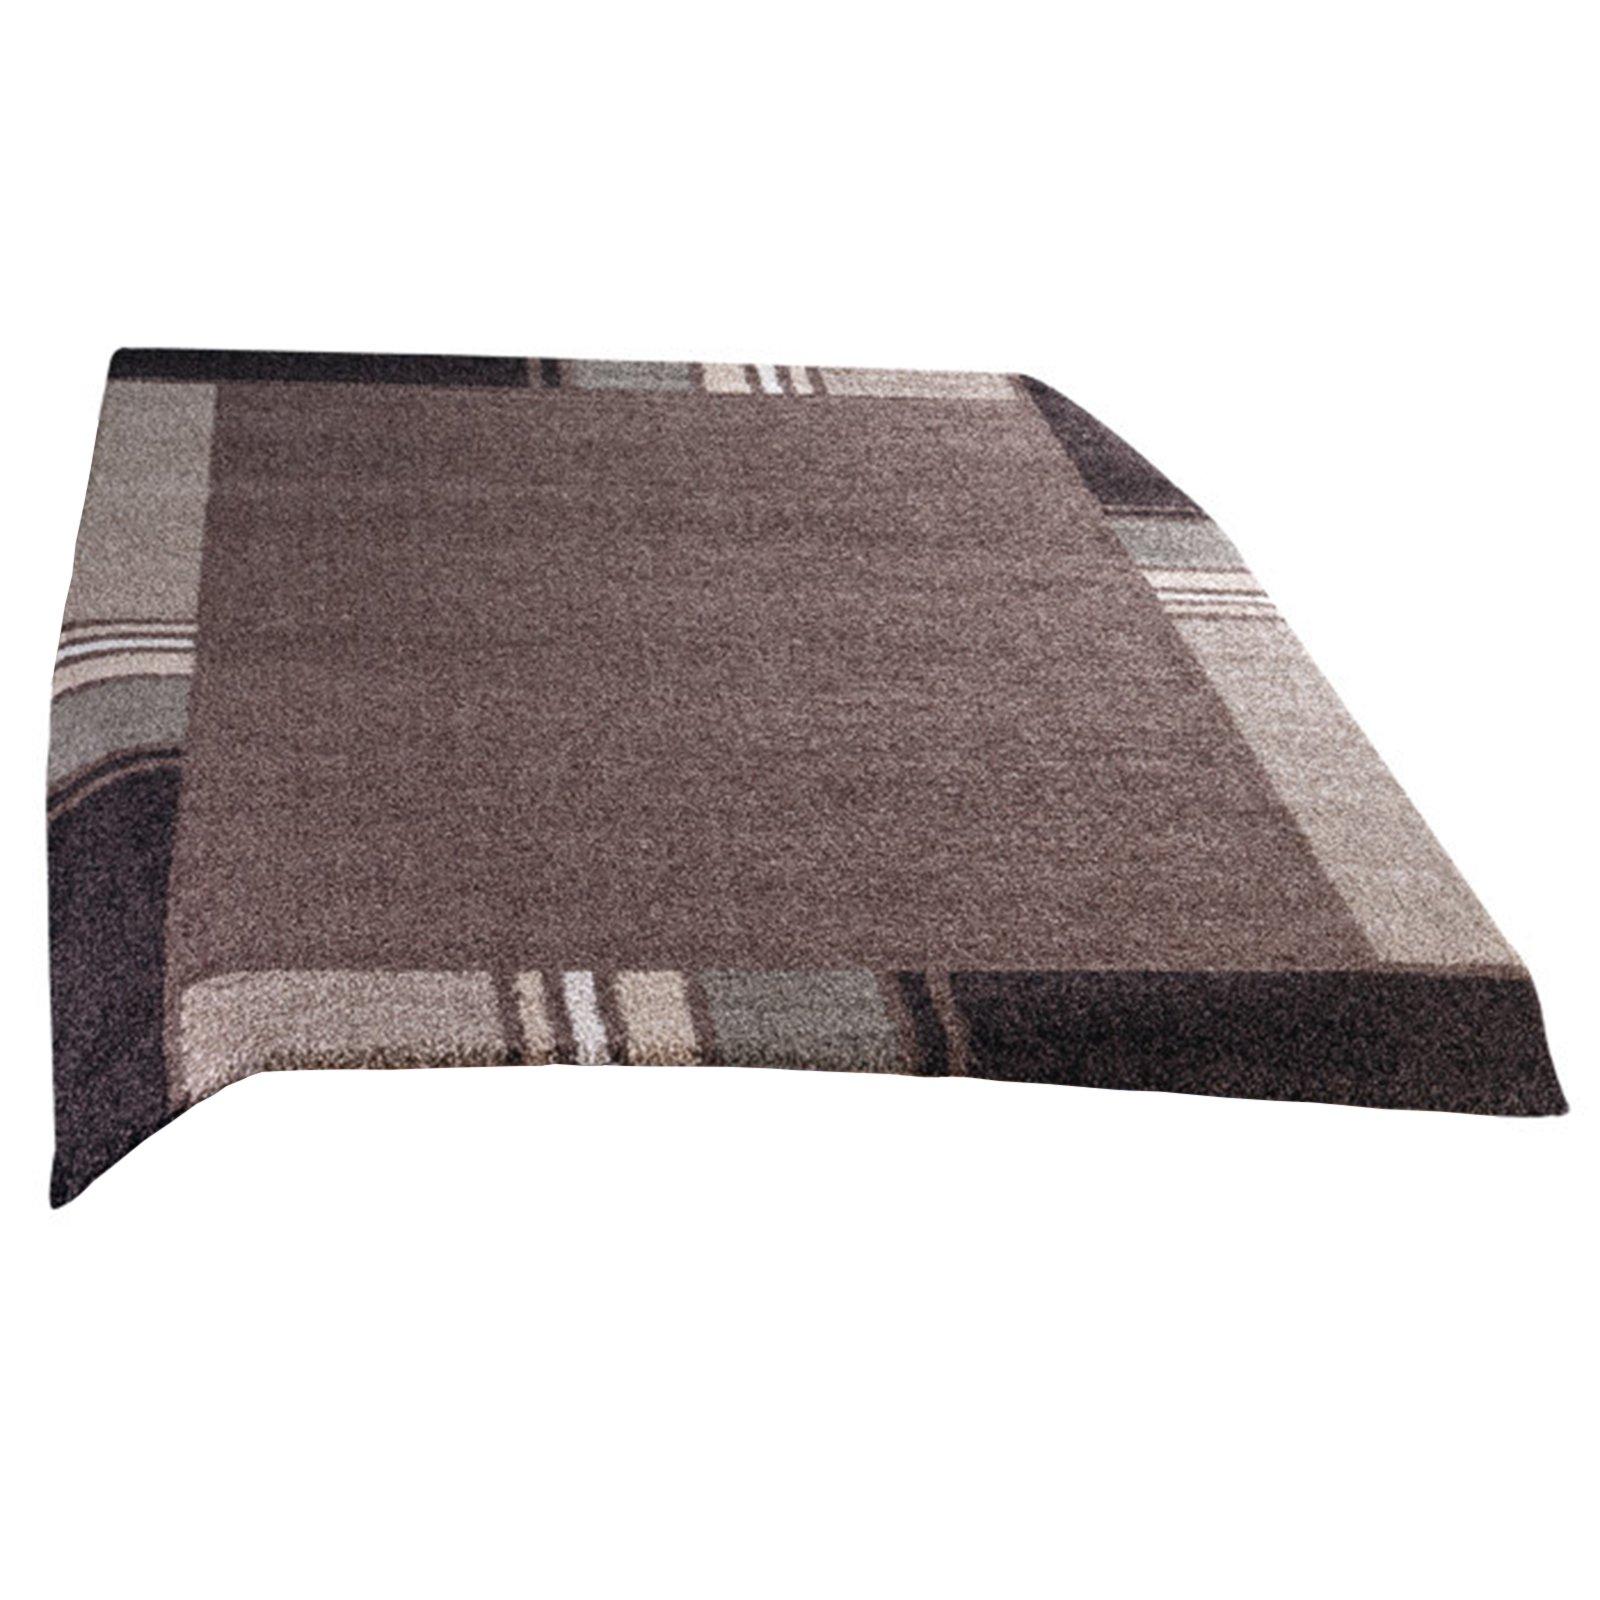 frisee teppich casa braun 120x170 cm gemusterte teppiche teppiche l ufer deko. Black Bedroom Furniture Sets. Home Design Ideas